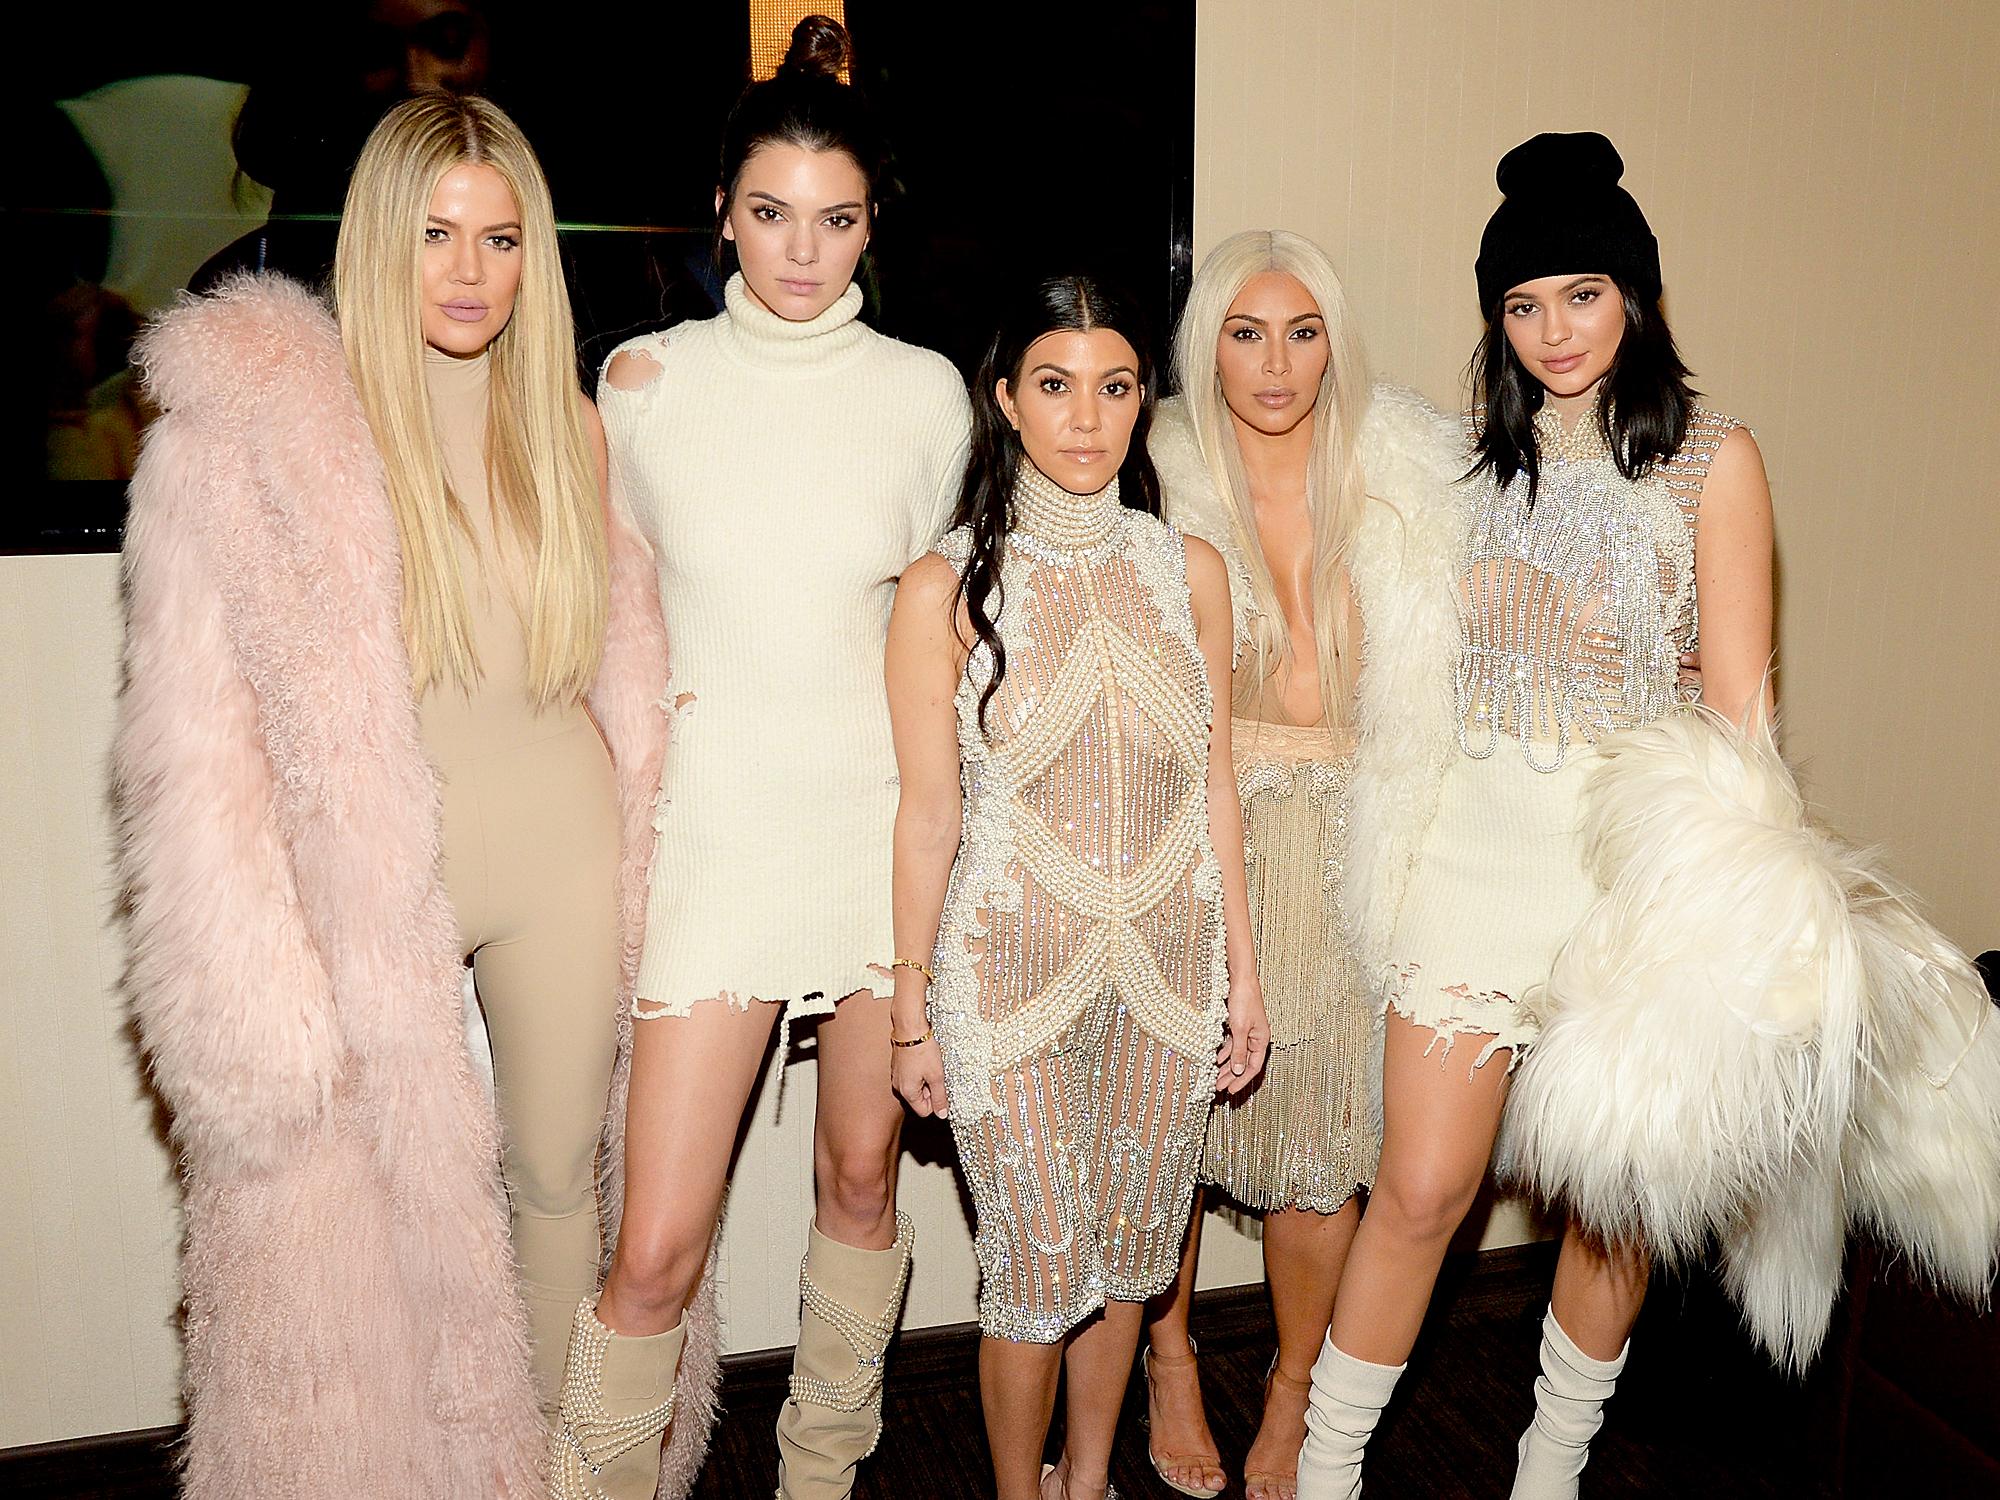 Khloe Kardashian, Kendall Jenner, Kourtney Kardashian, Kim Kardashian and Kylie Jenner